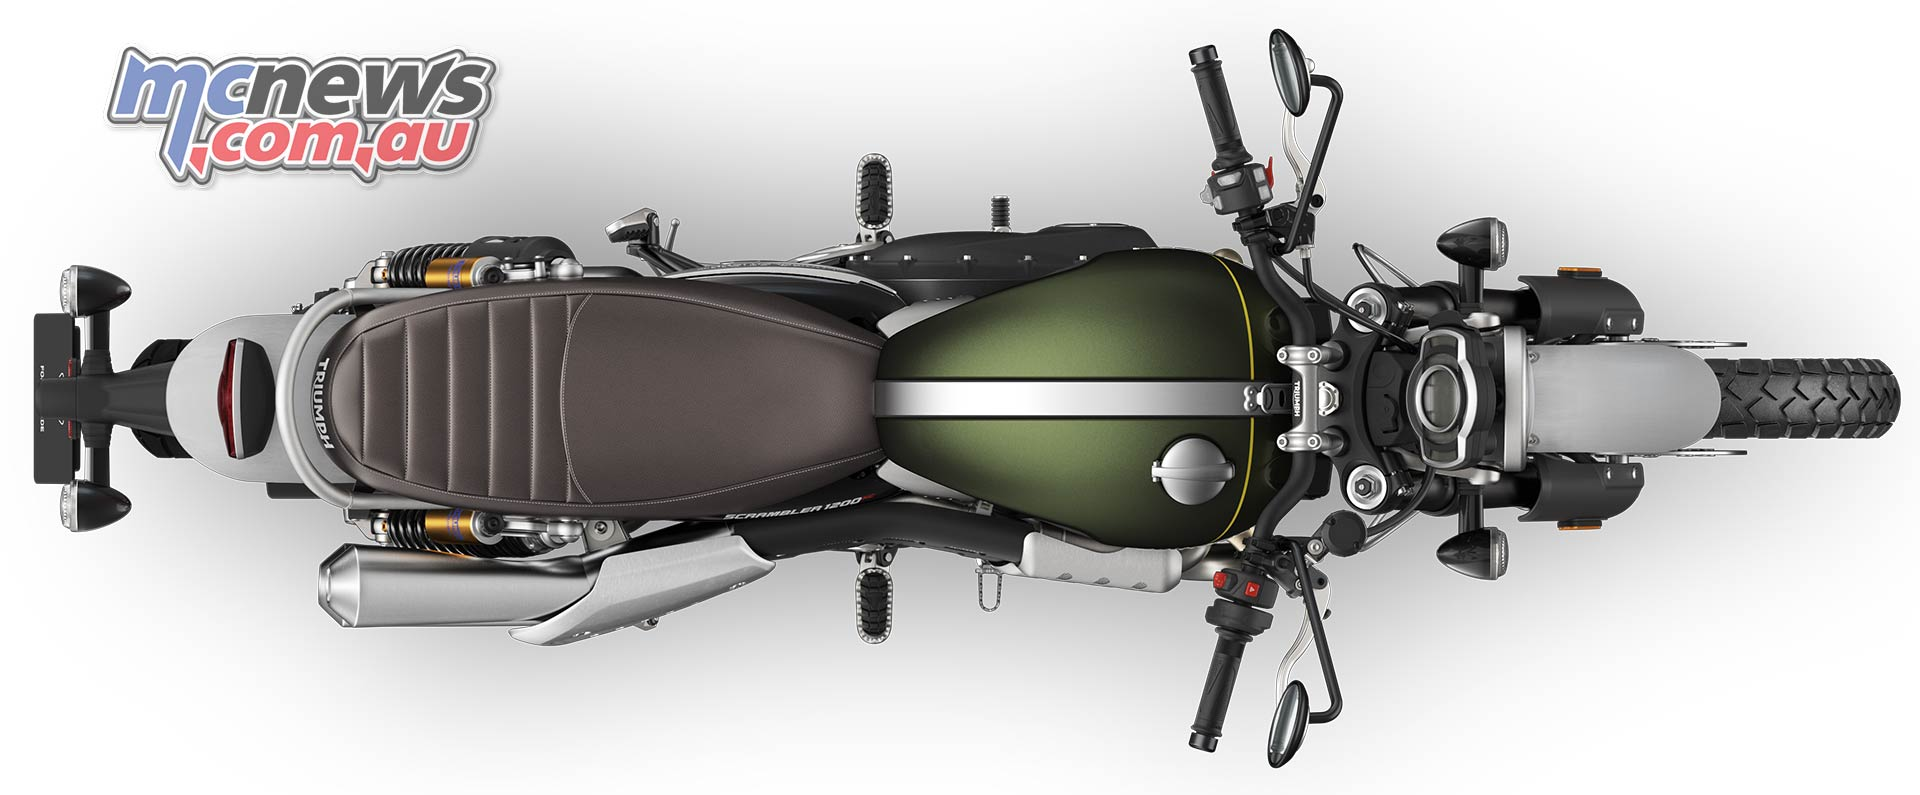 Triumph Scrambler XC Top